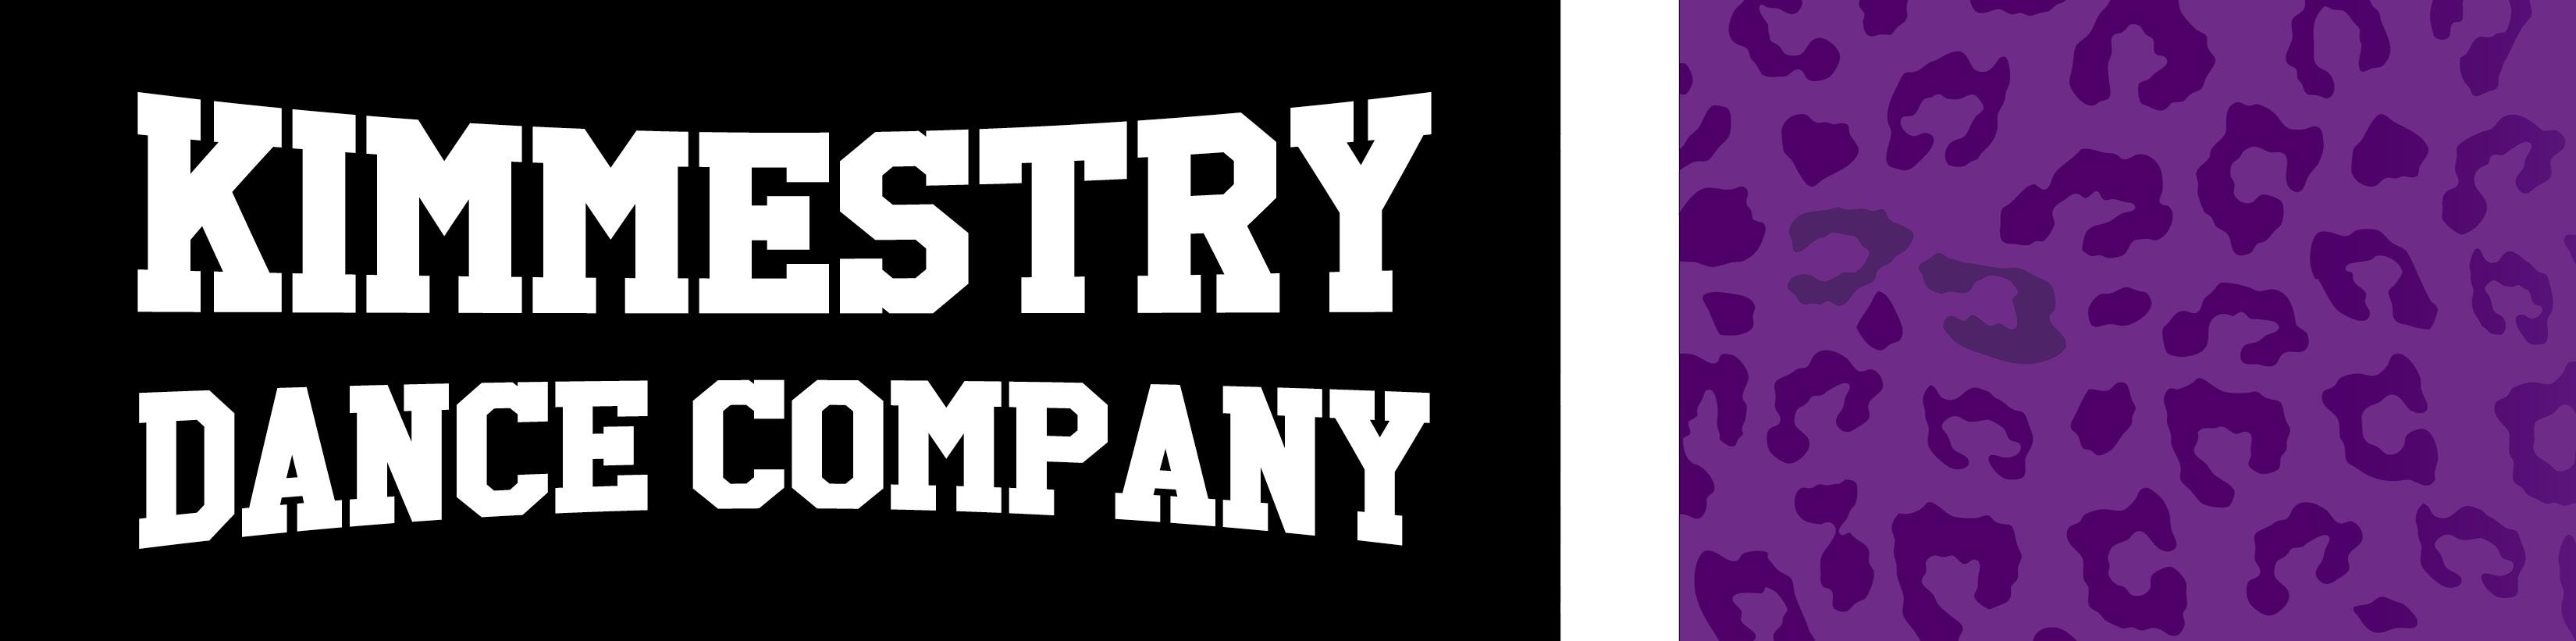 Kimmestry Dance Company